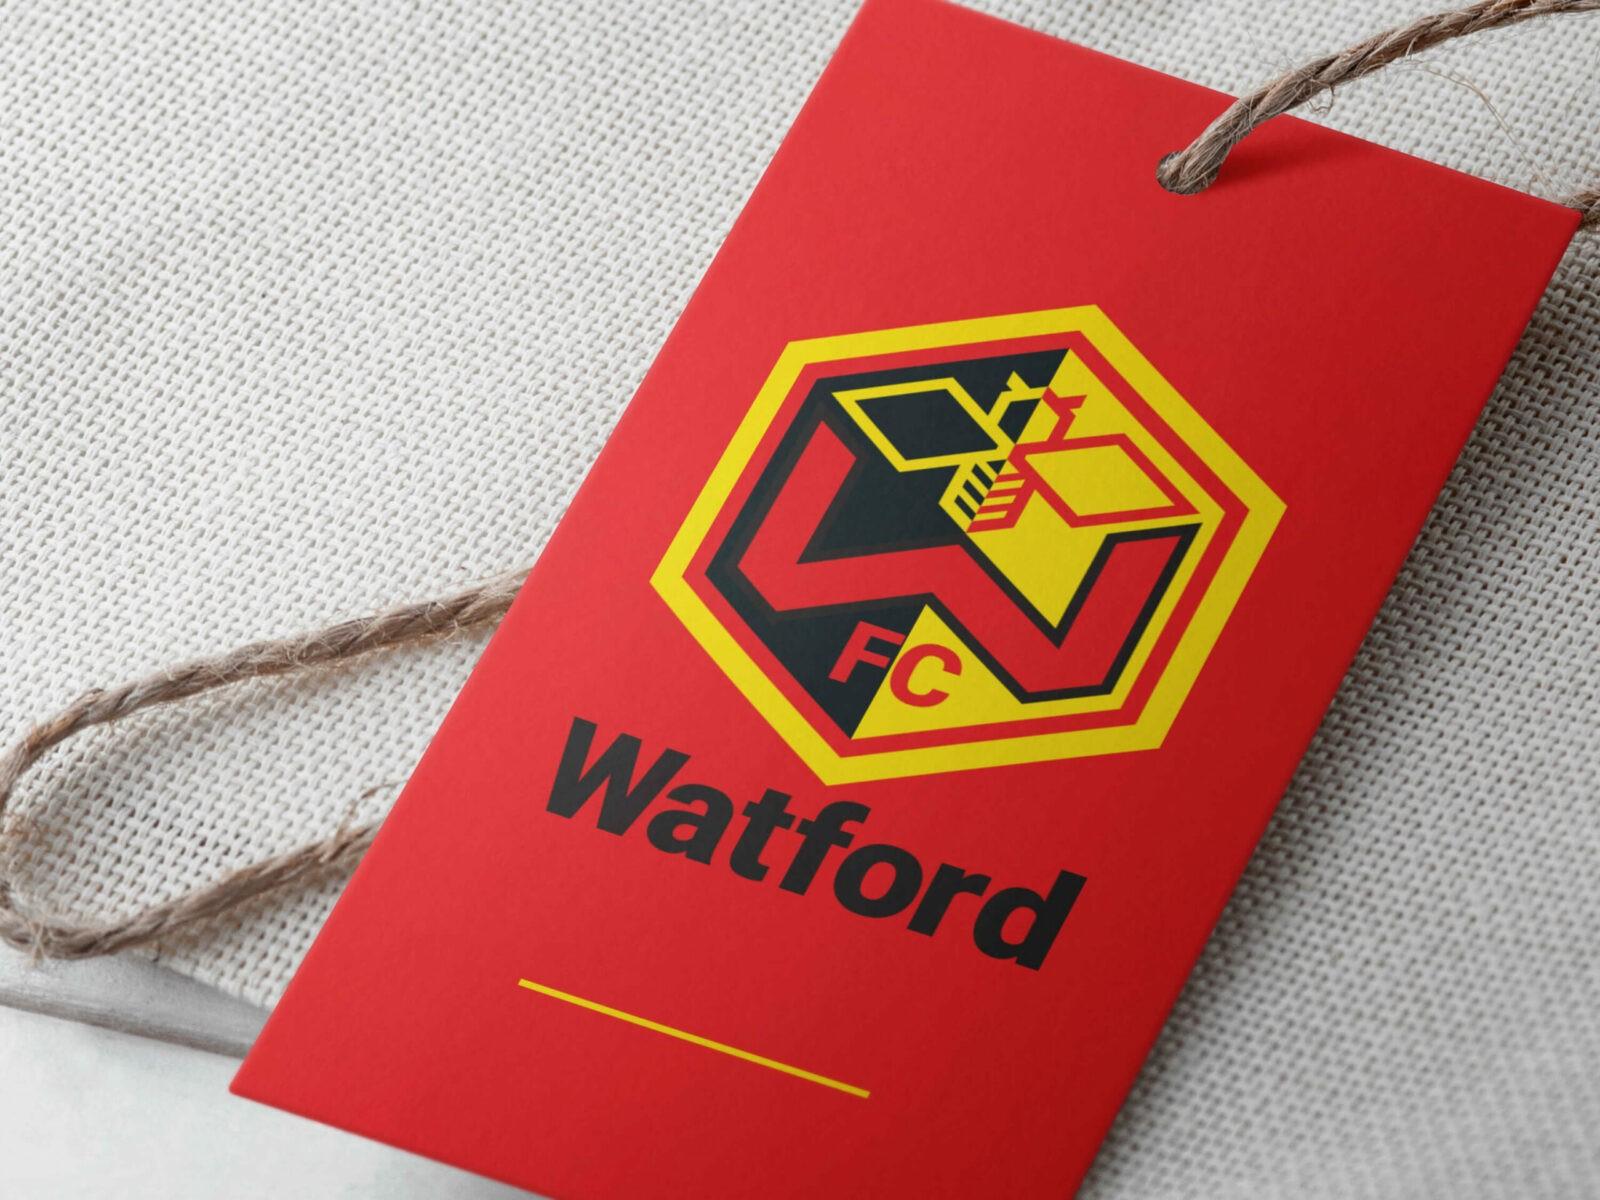 Watford FC.